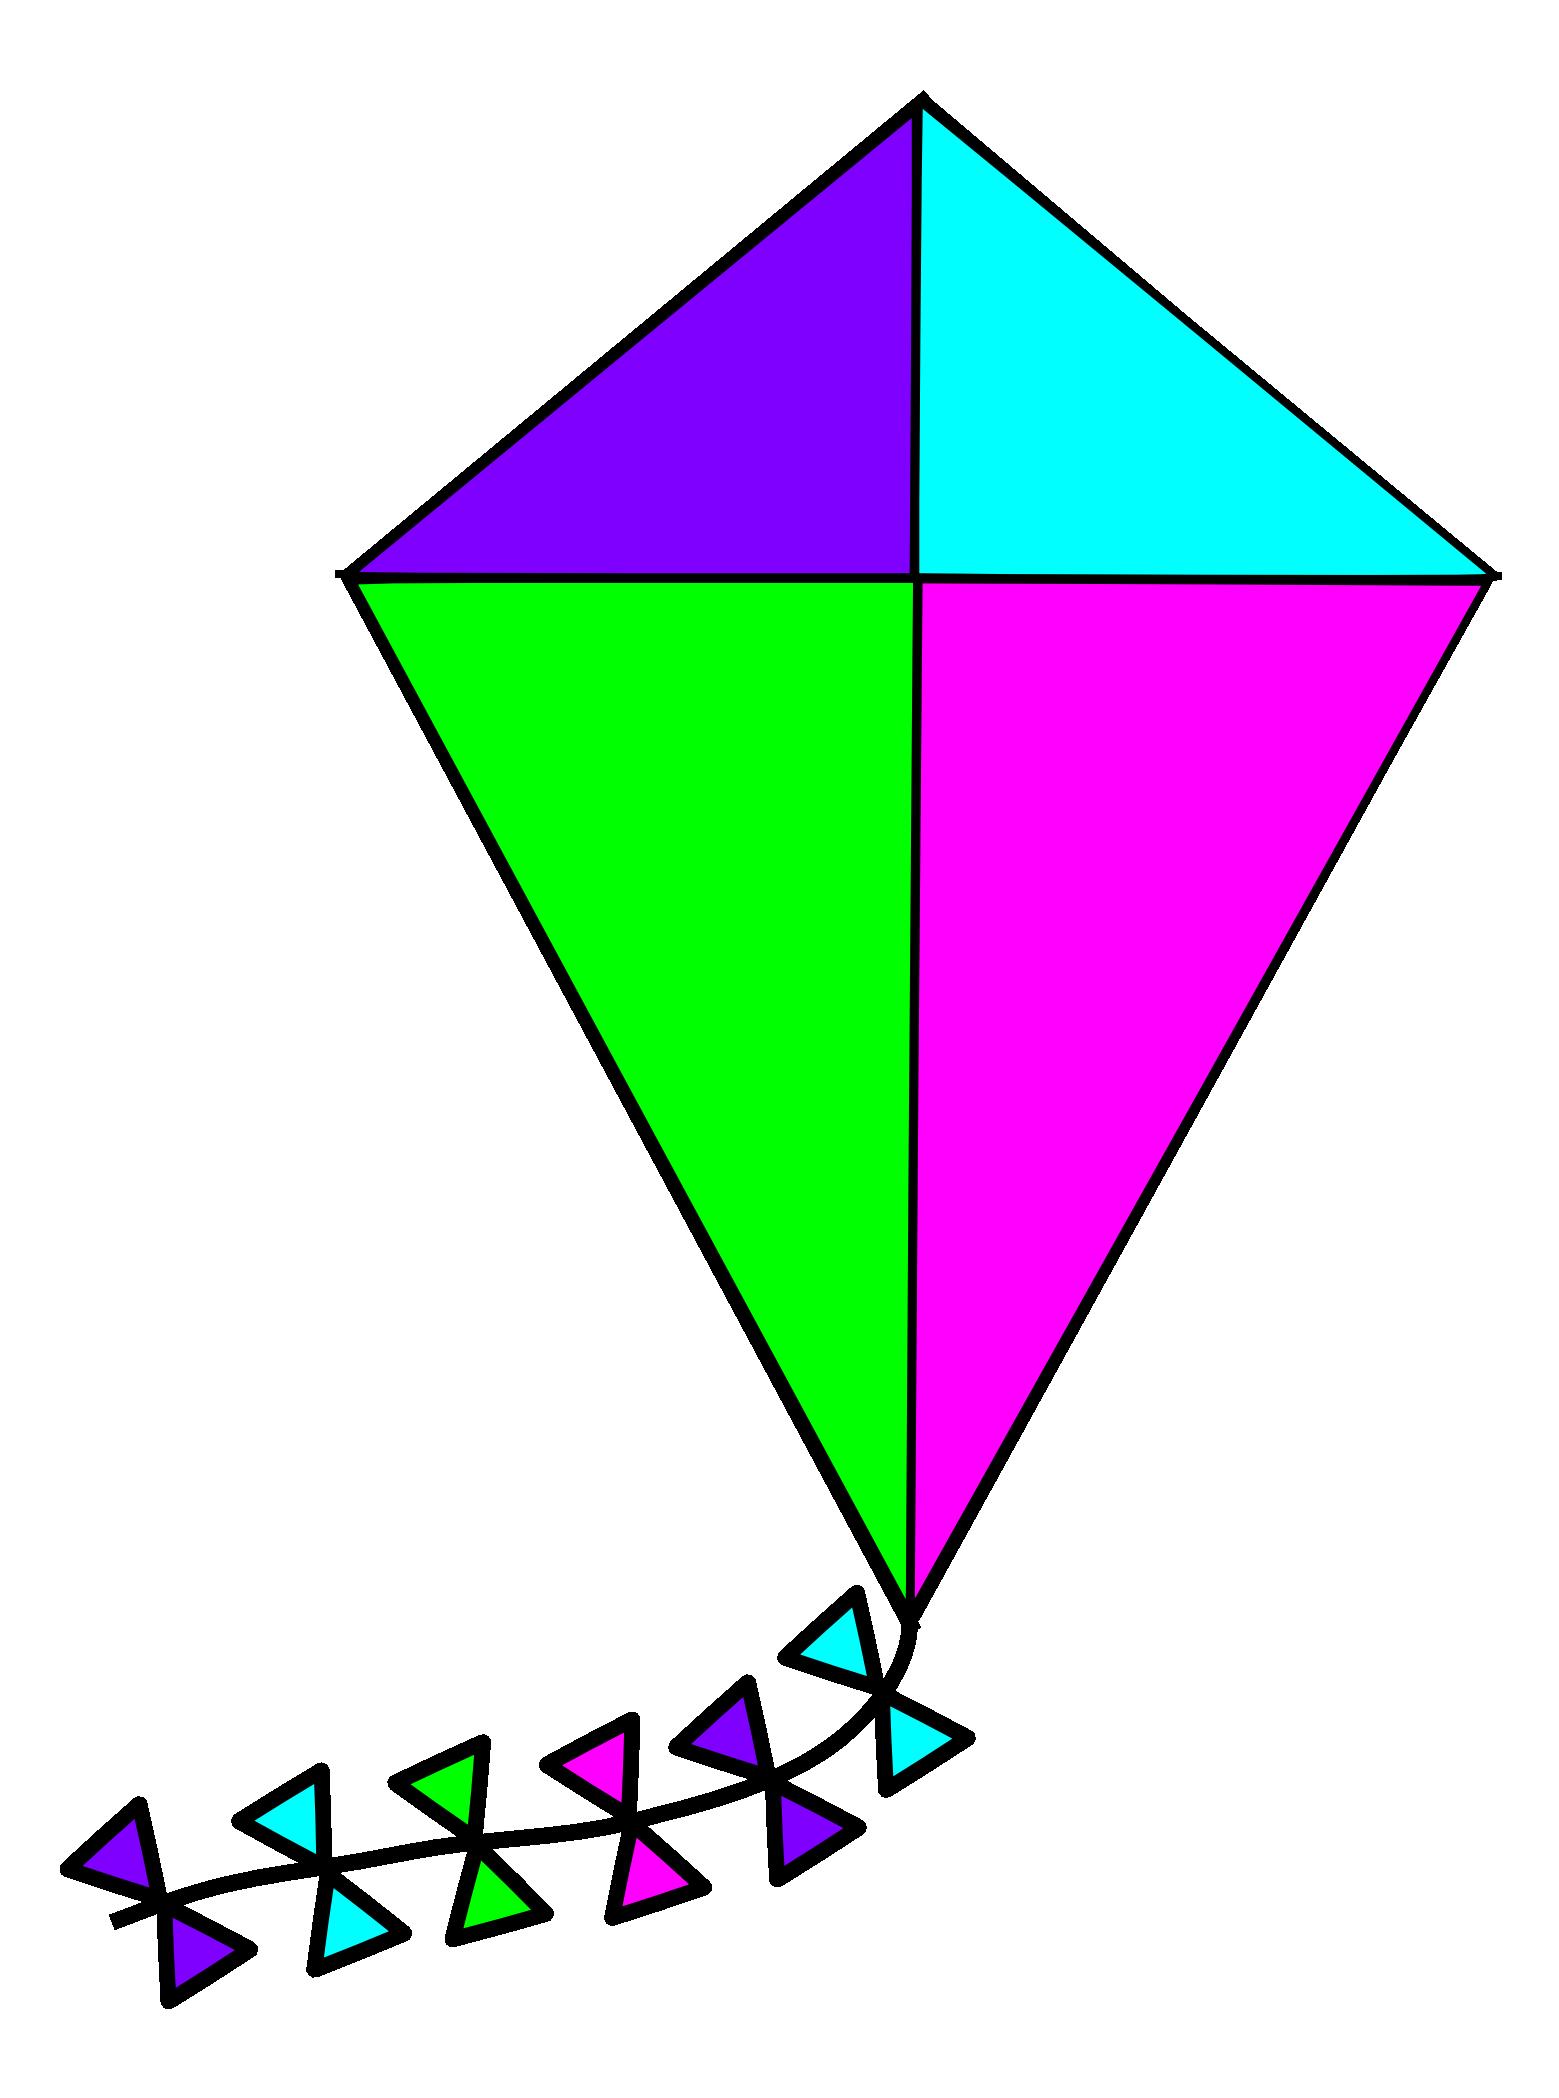 Kite clipart toy. Png transparent image pngpix